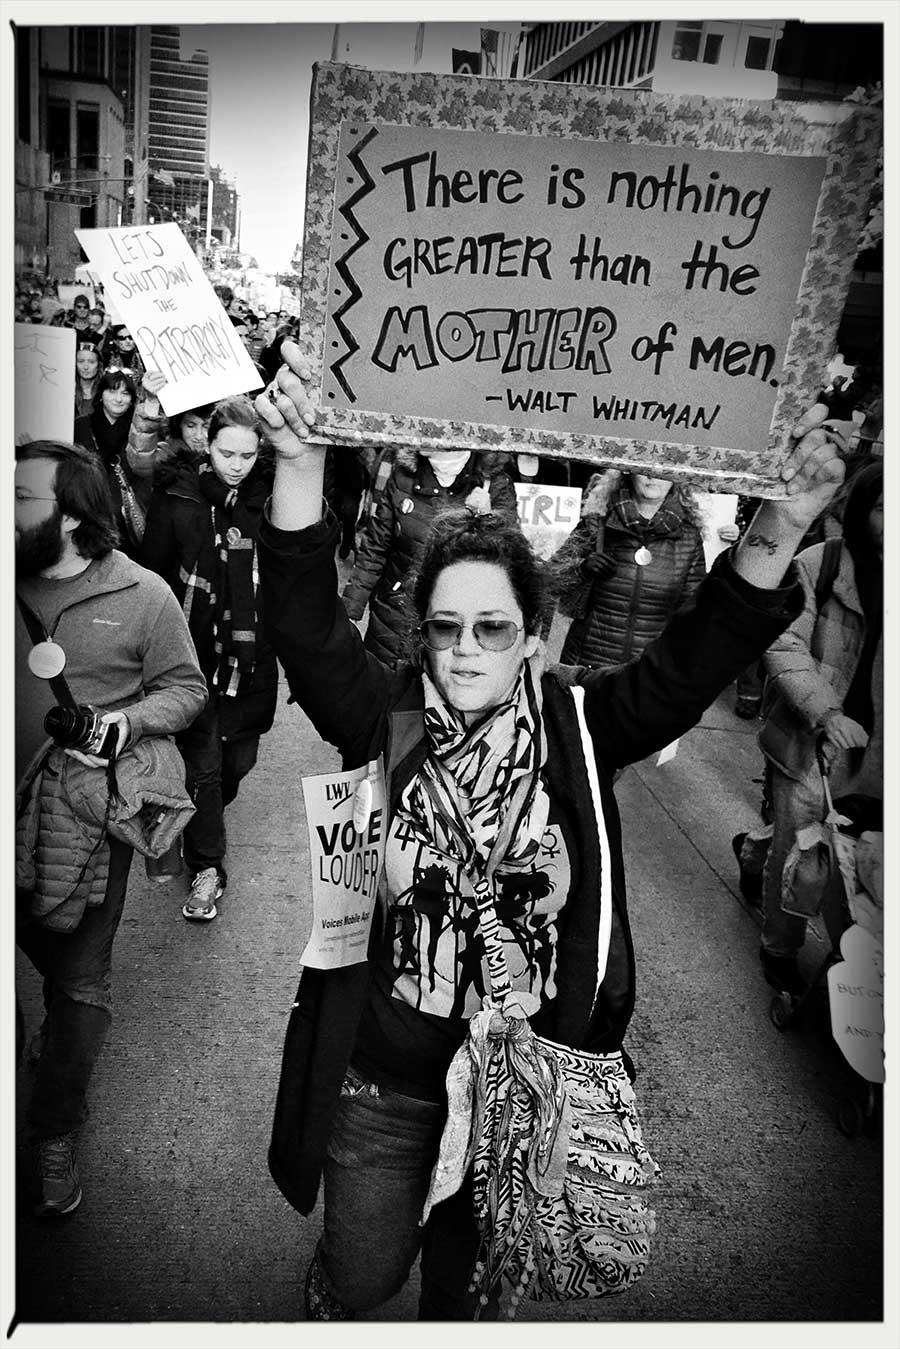 Erik-Lieber-Women-marches-2018-06